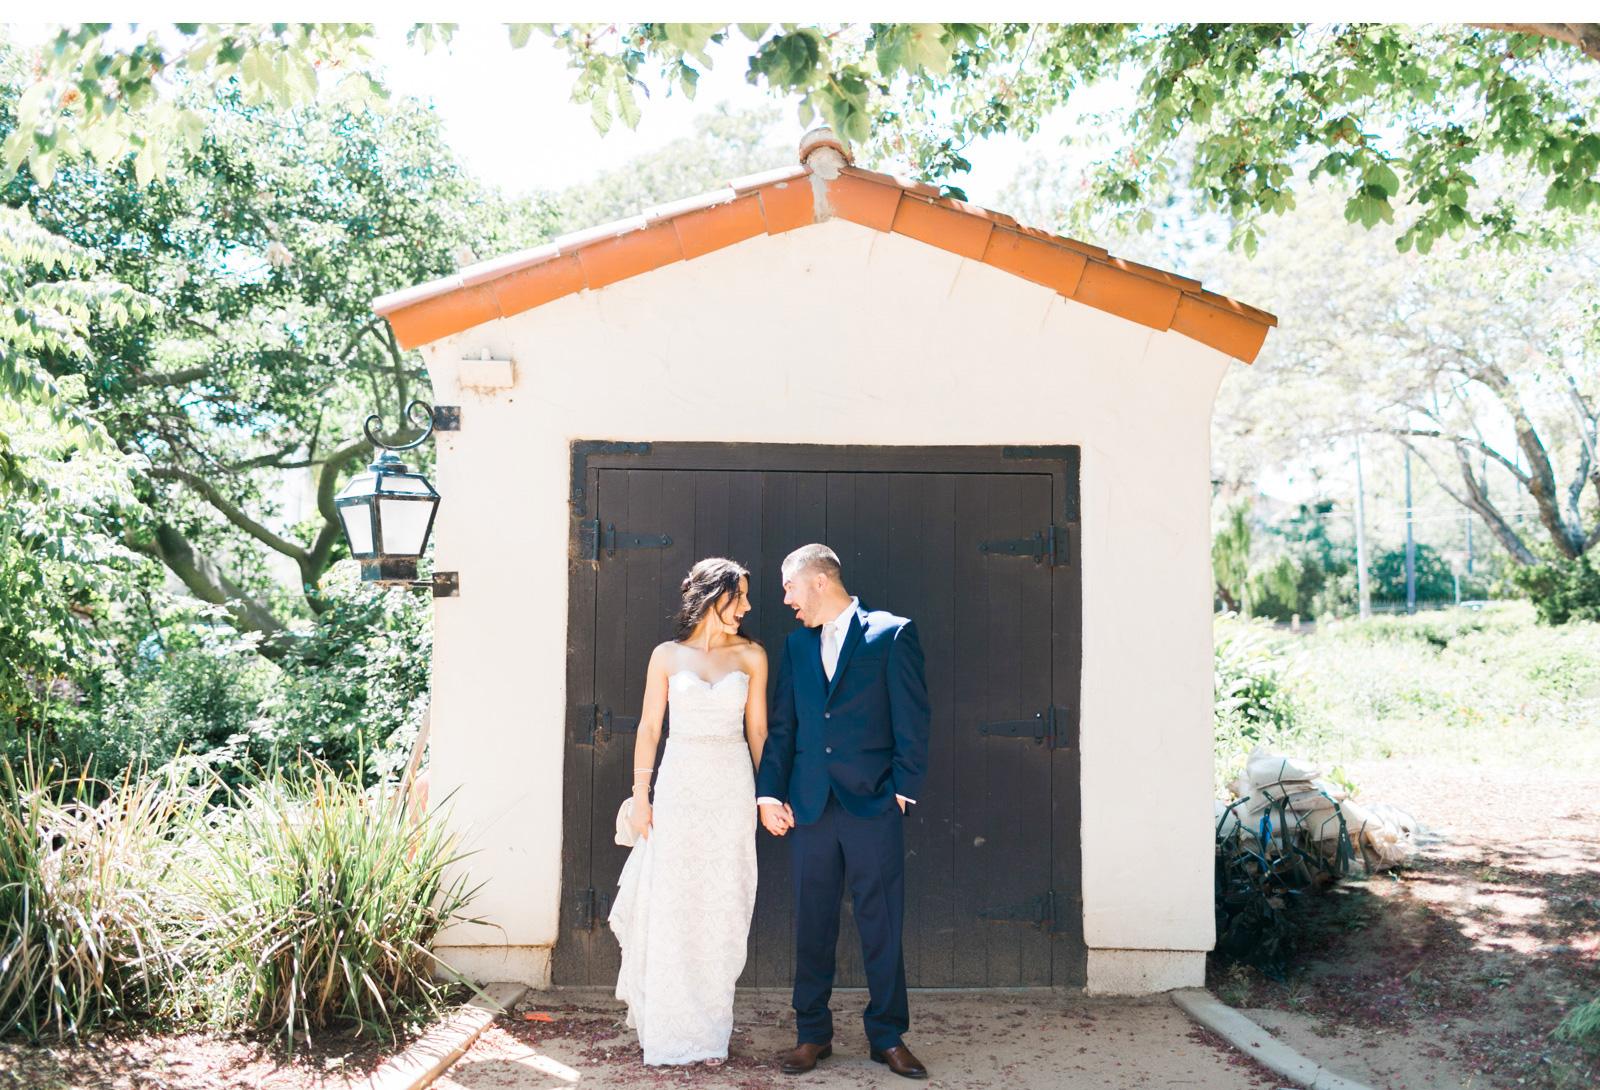 Southern-California-Santa-Barbara-Wedding-Photographer-Natalie-Schutt-Photography_08.jpg